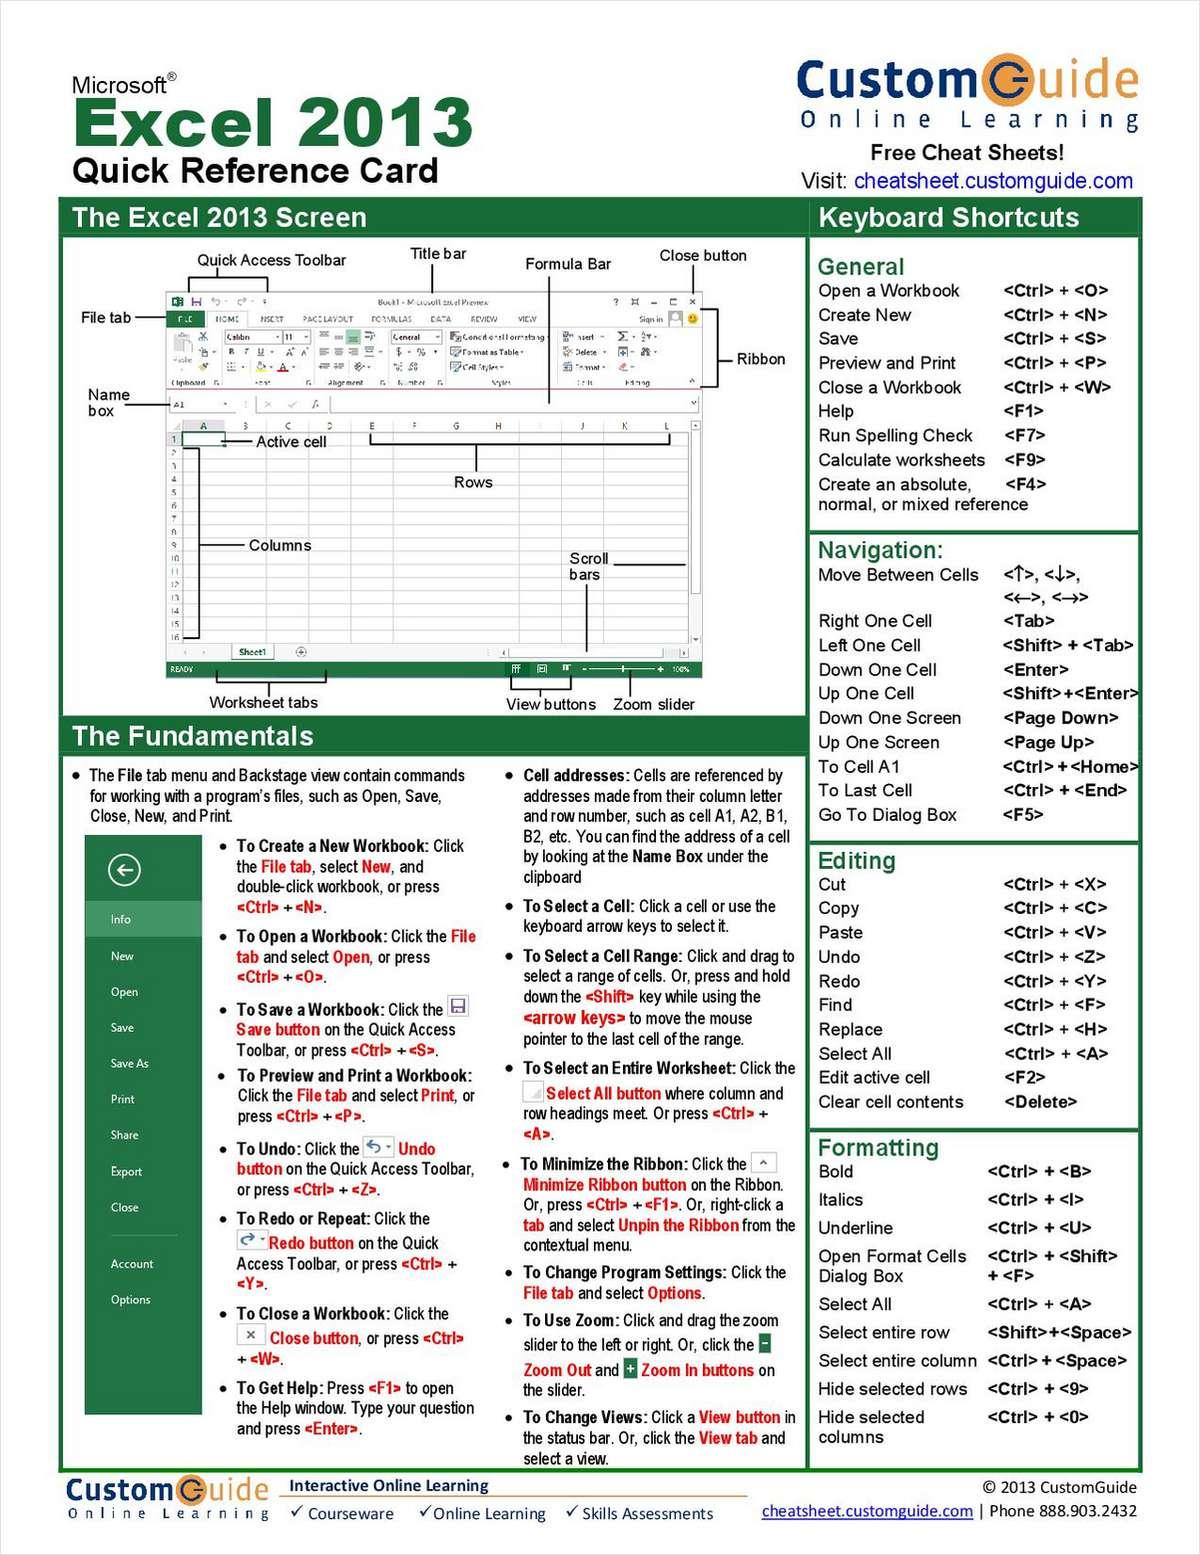 microsoft excel 2013 quick reference guide free customguide tips rh dailywhitepaper tradepub com Quick Reference Guide Layout Quick Reference Guide Examples